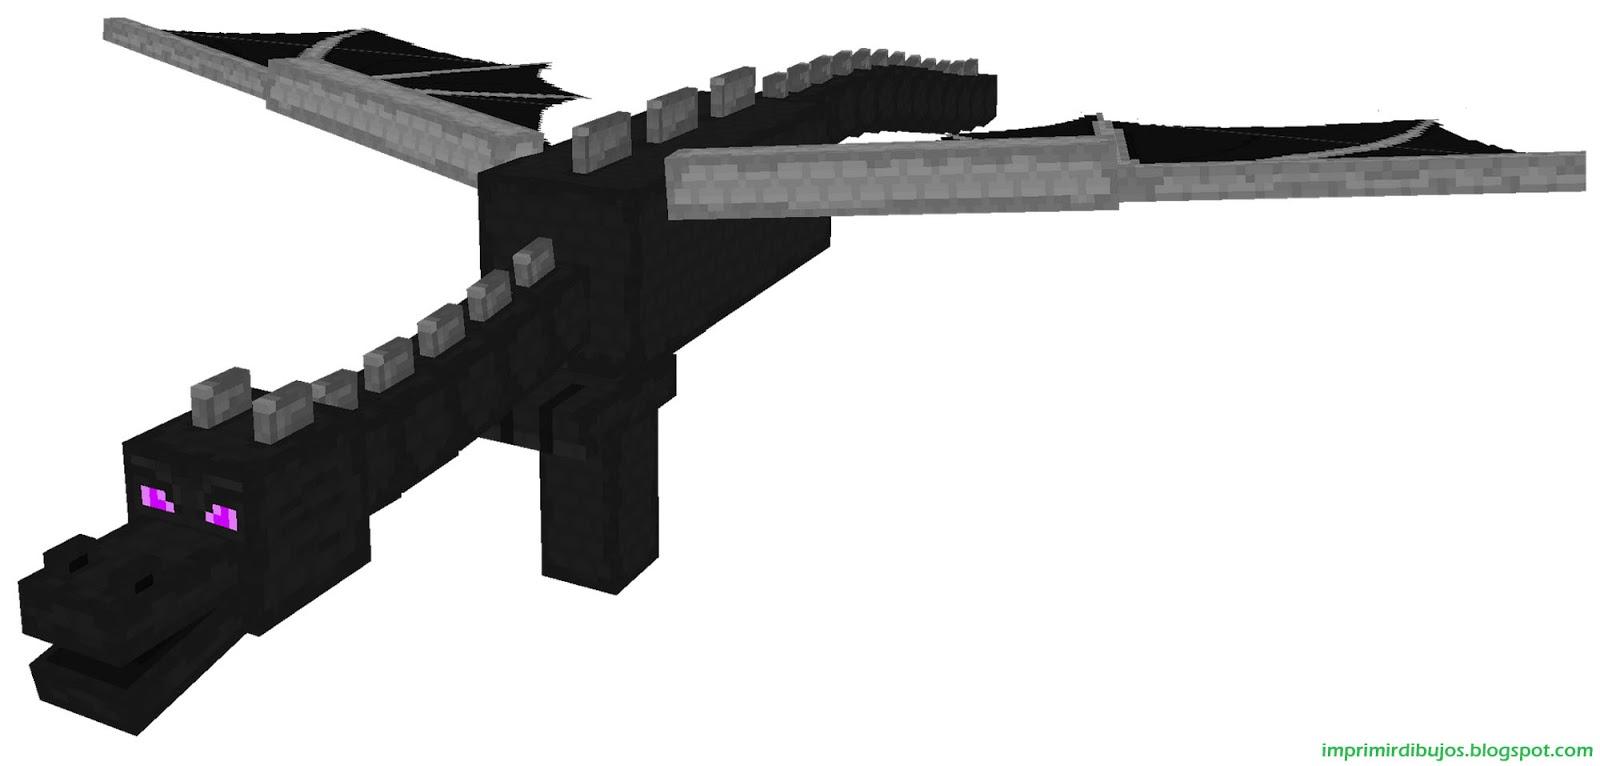 Imprimir Dibujos: Personajes de Minecraft para Imprimir